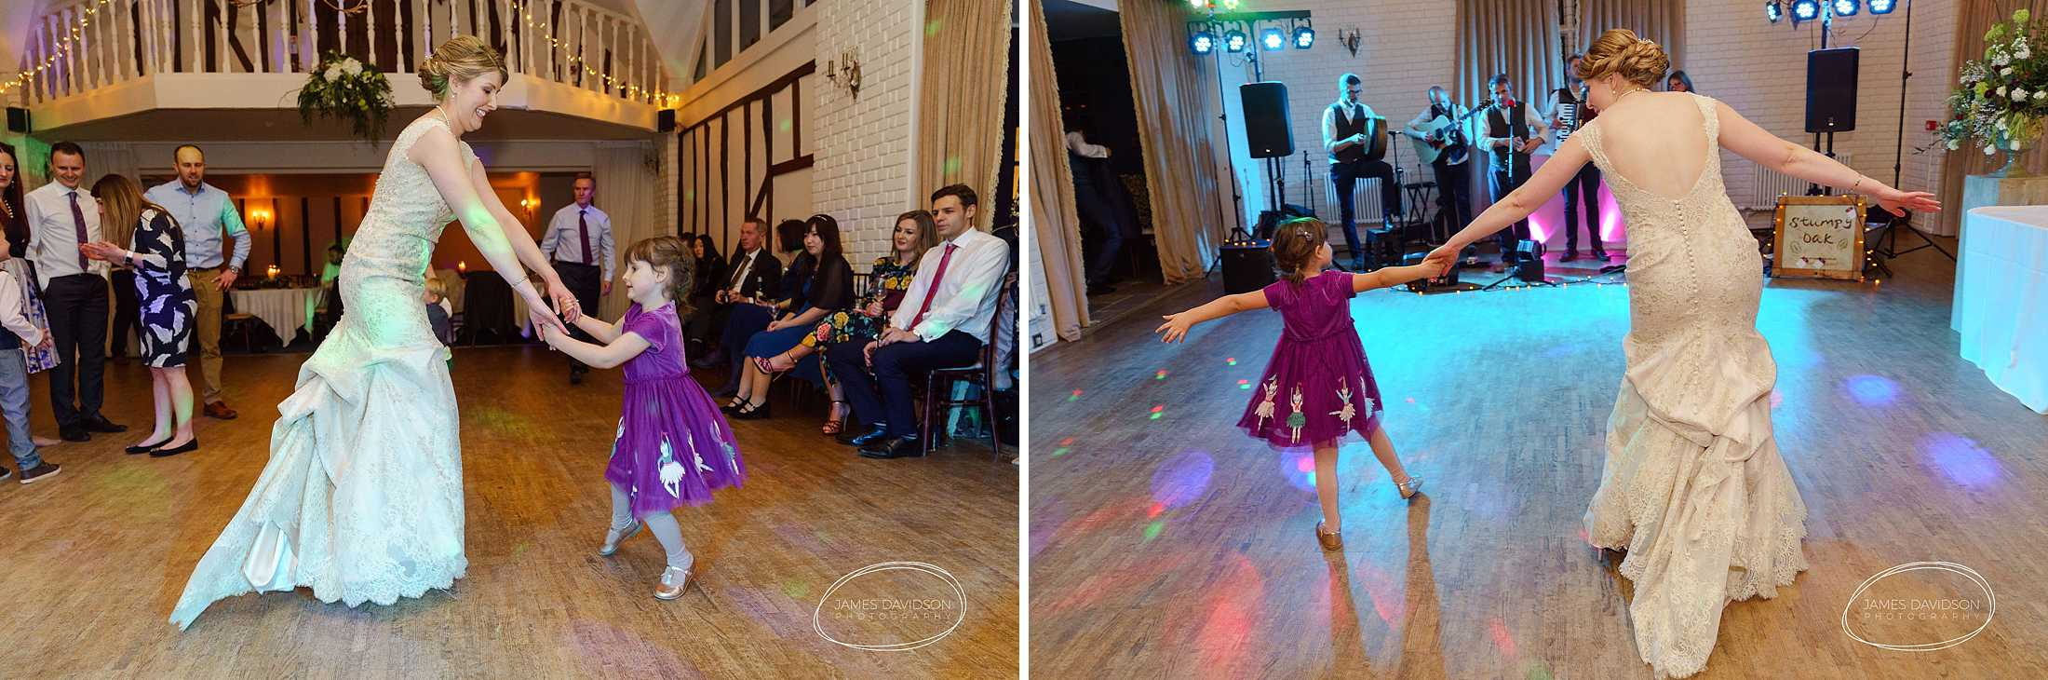 seckford-hall-wedding-105